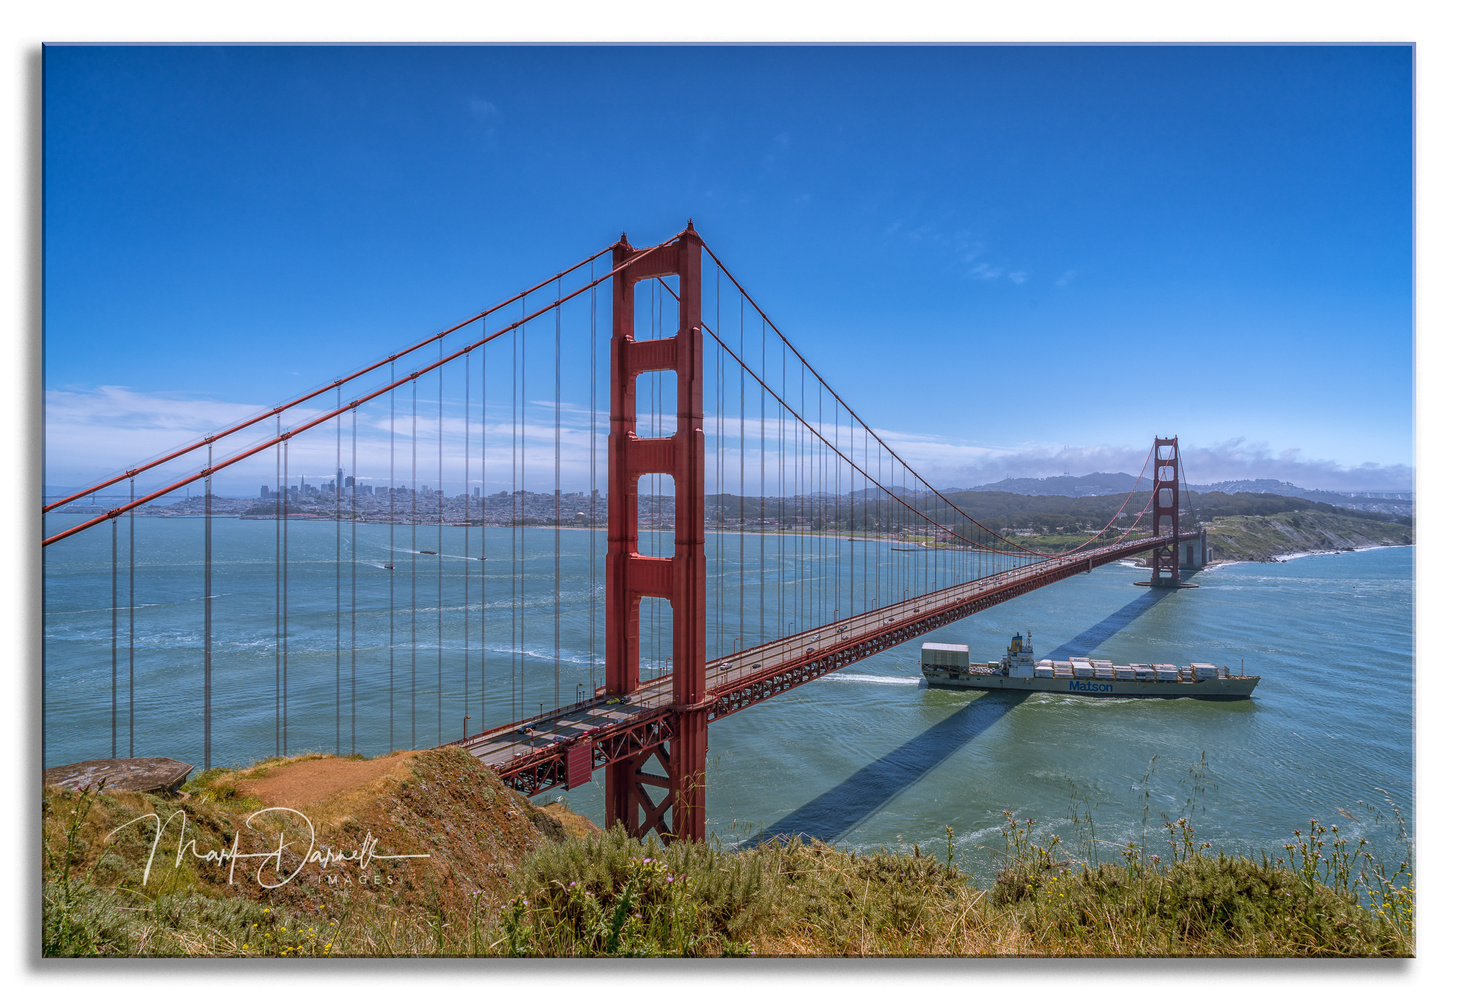 Golden Gate Passage by Mark Darnell